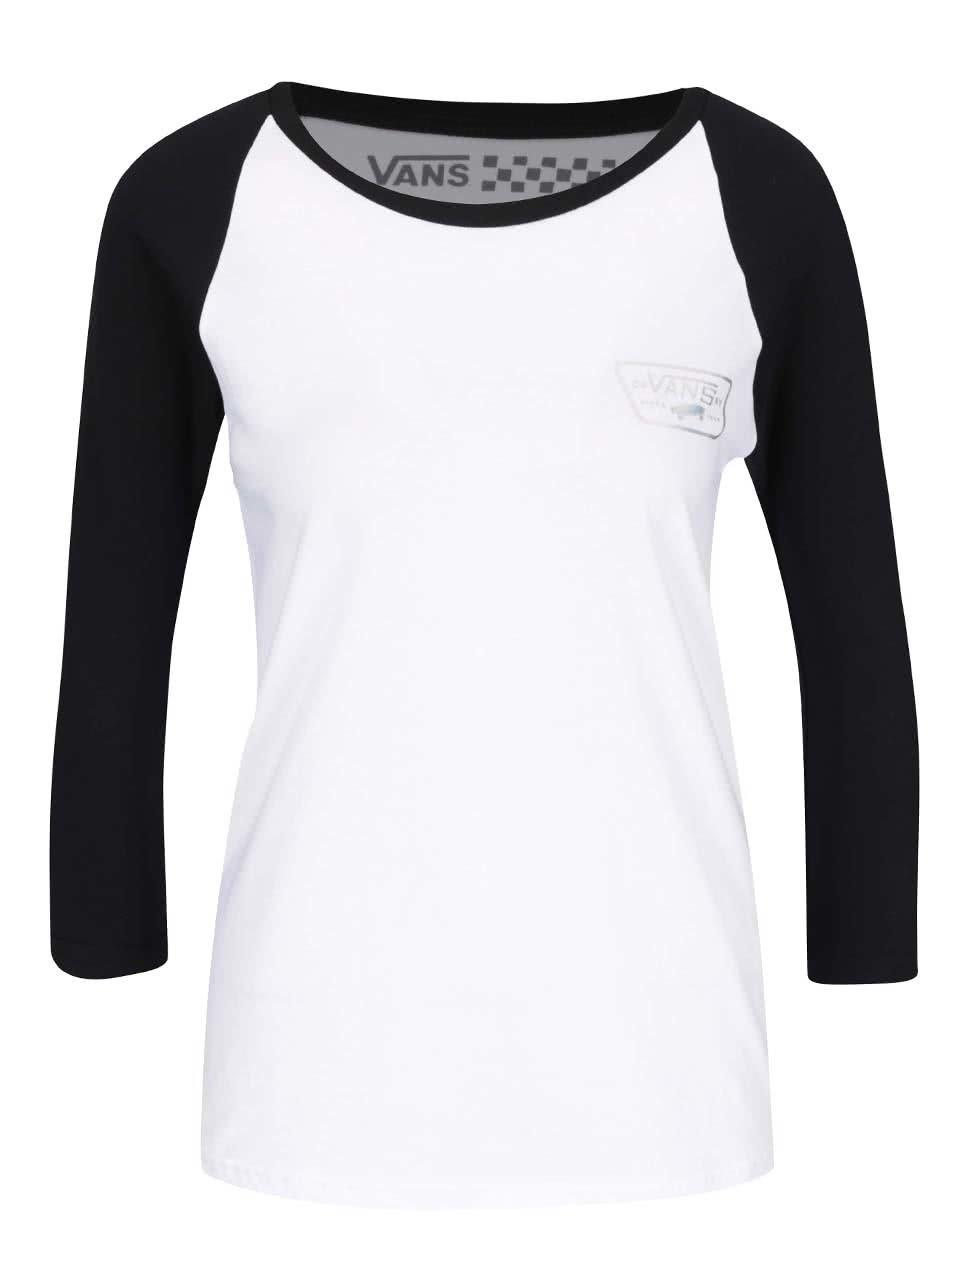 Černo-bílé dámské tričko 3/4 rukávy Vans Hologram Raglan